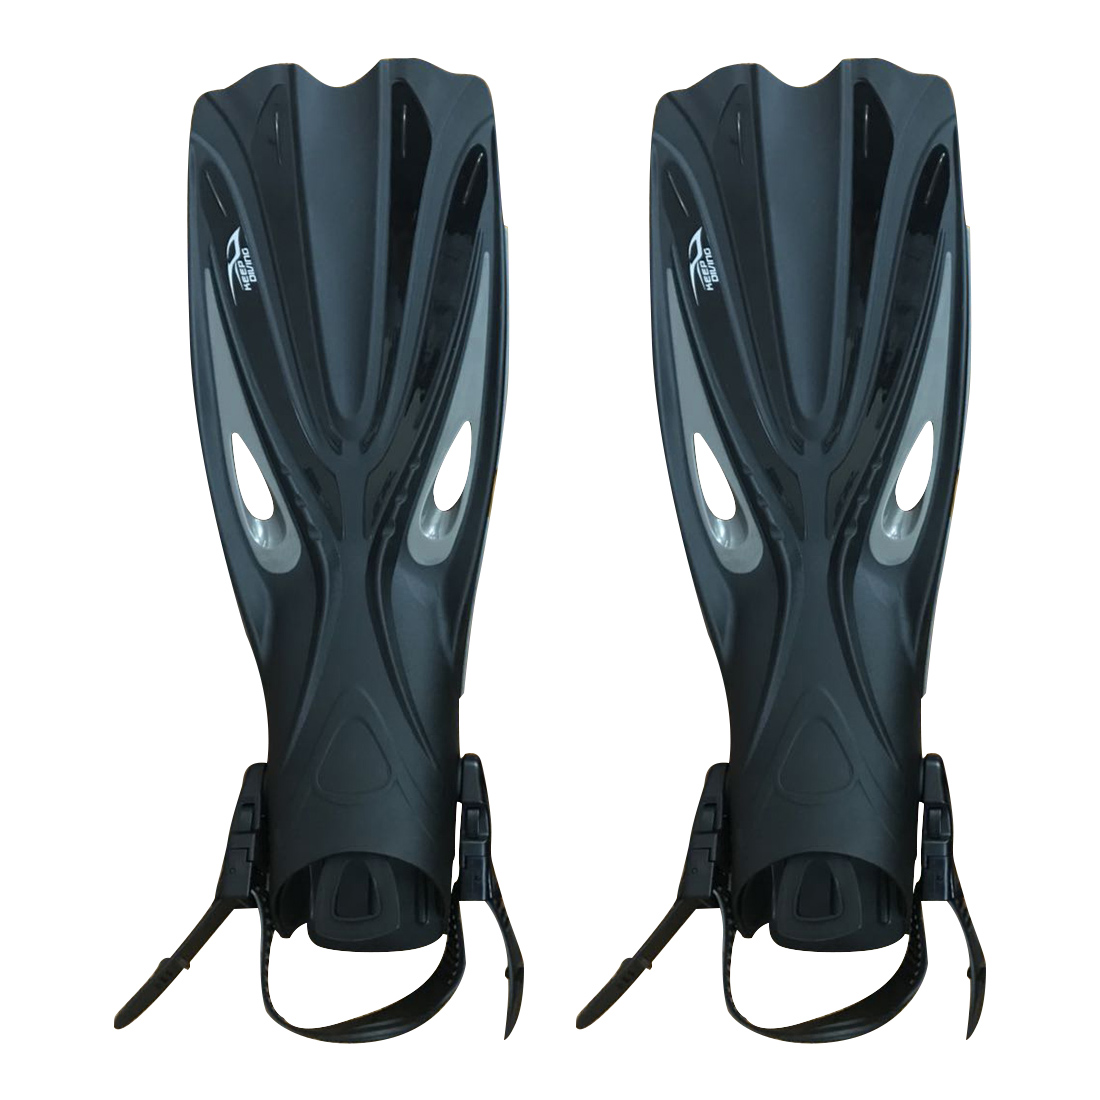 GARDER la PLONGÉE Ouvert Talon Plongée sous-marine Longues Nageoires Plongée En Apnée Réglable nageoires Spécial Pour la Plongée Bottes Chaussures Vitesse